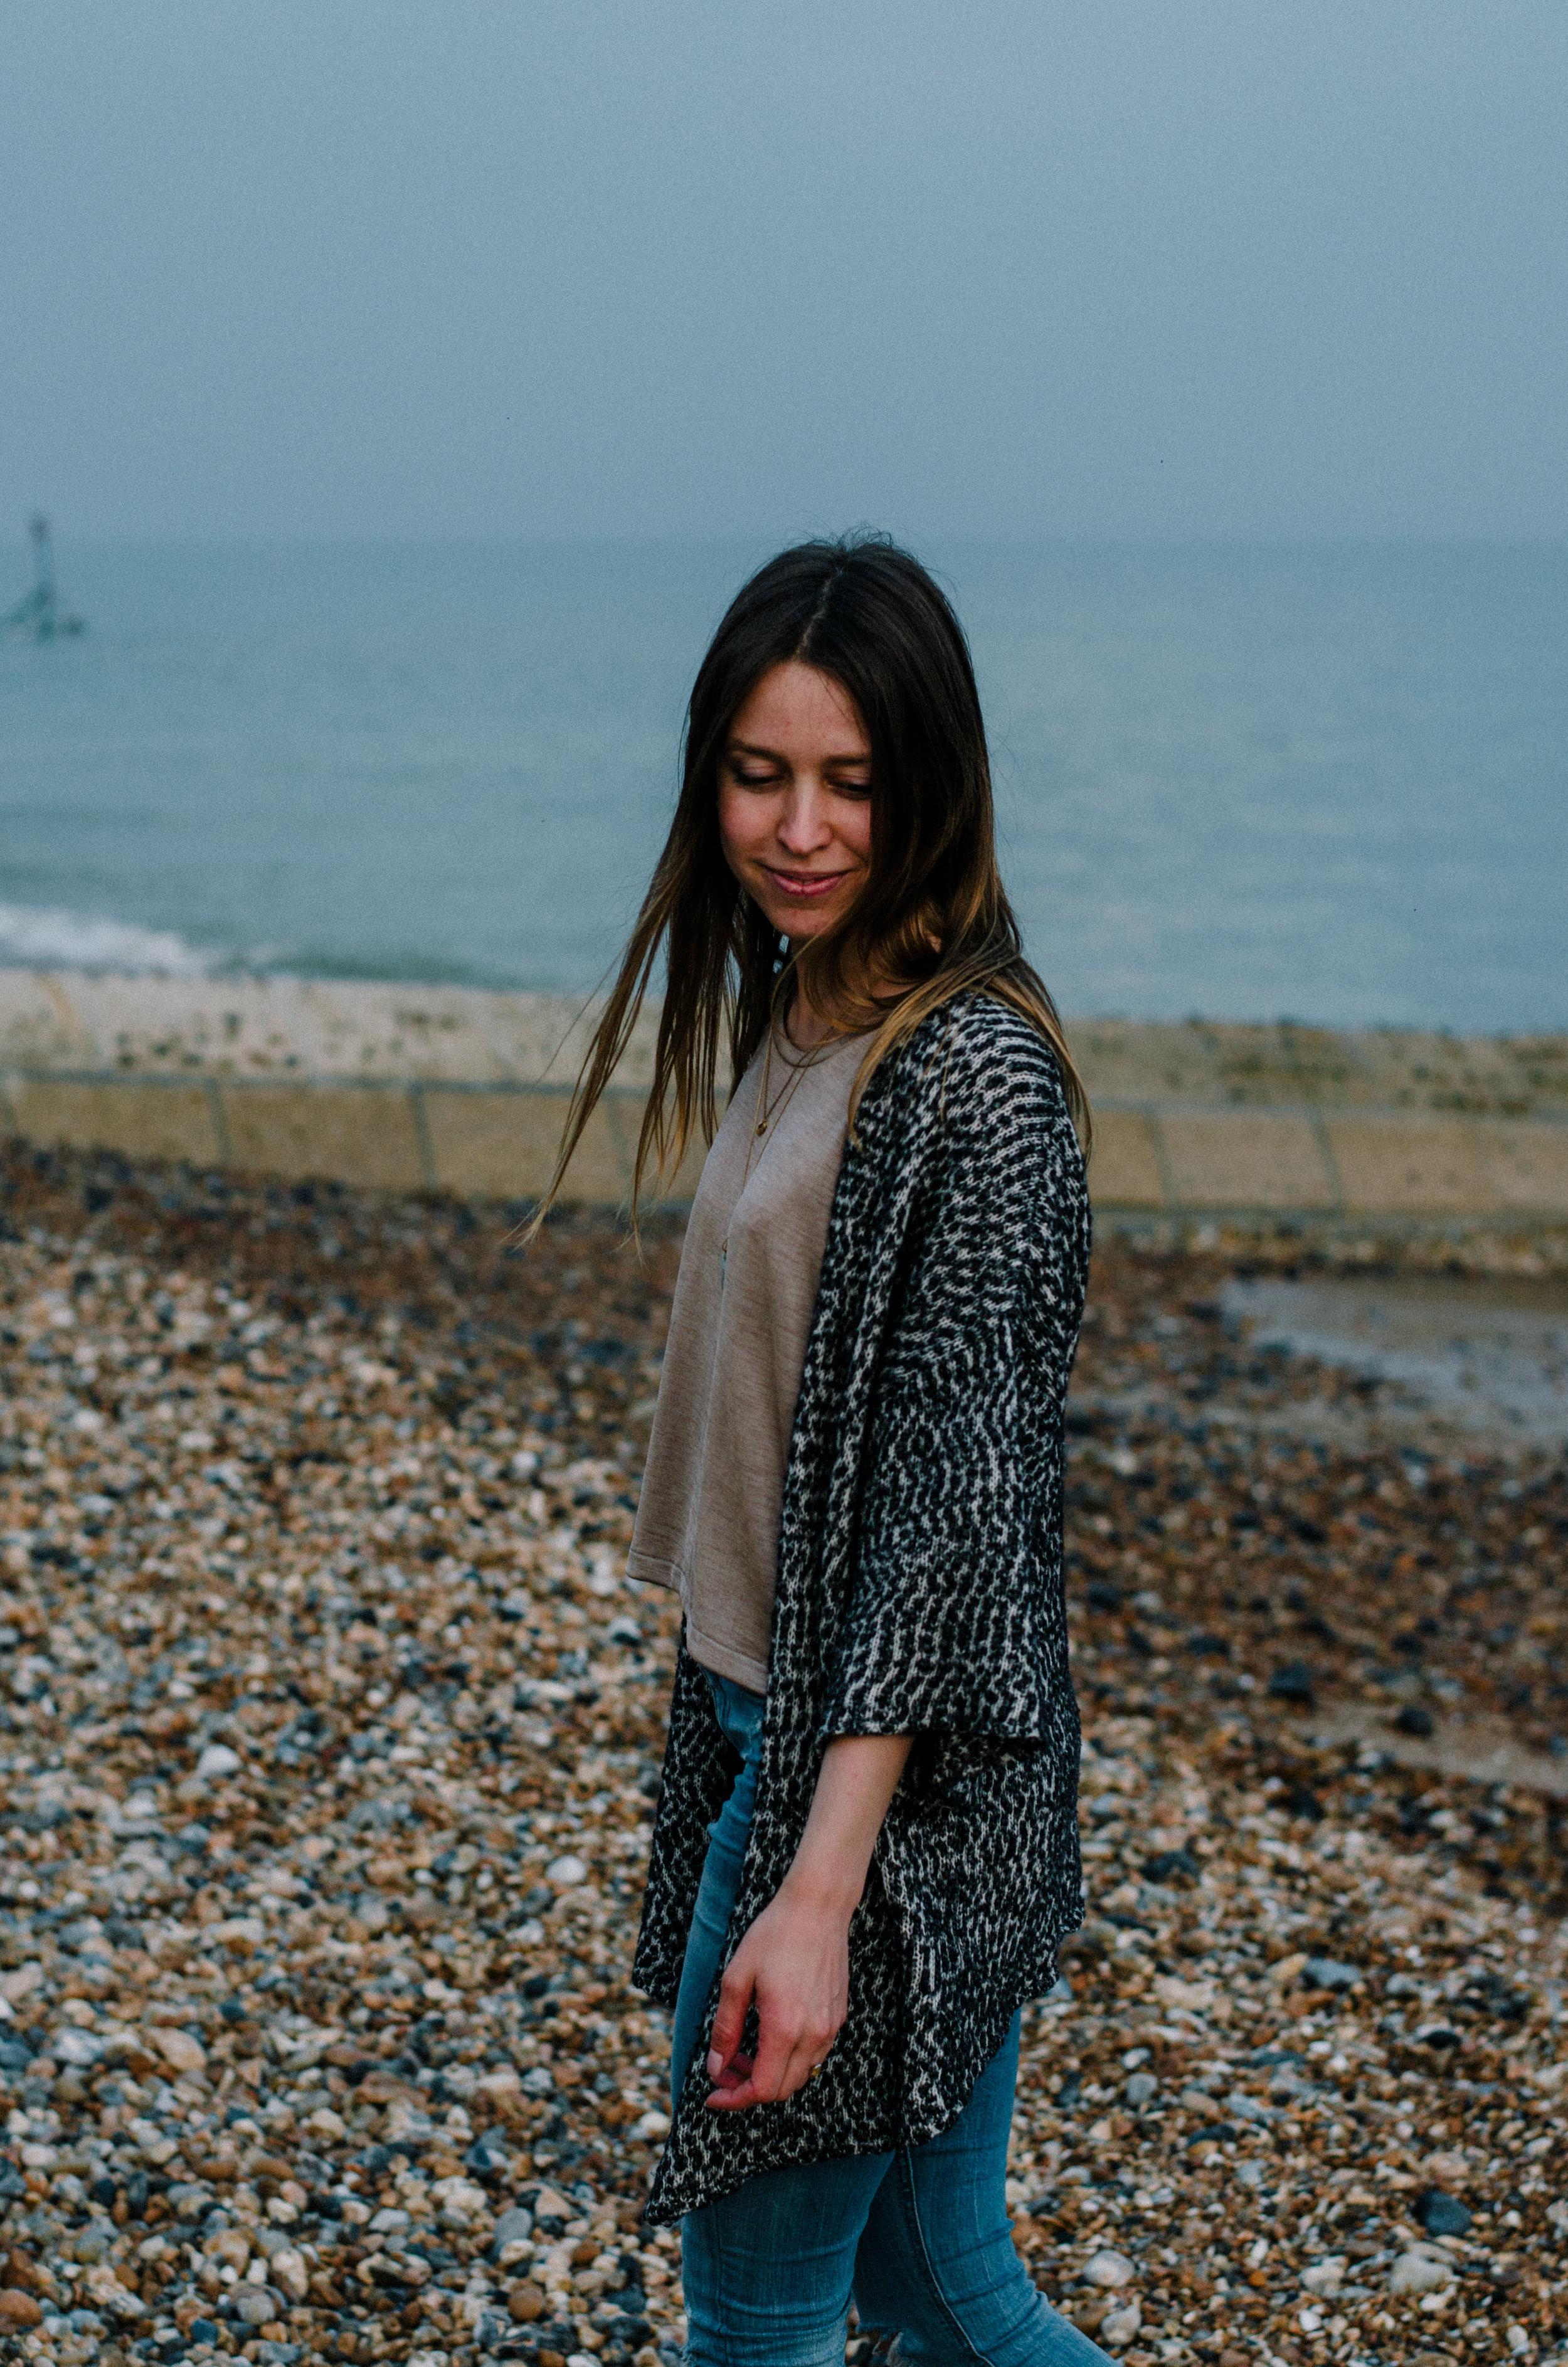 Lina - Portraits in Brighton - Aiste Saulyte Photography-39.jpg